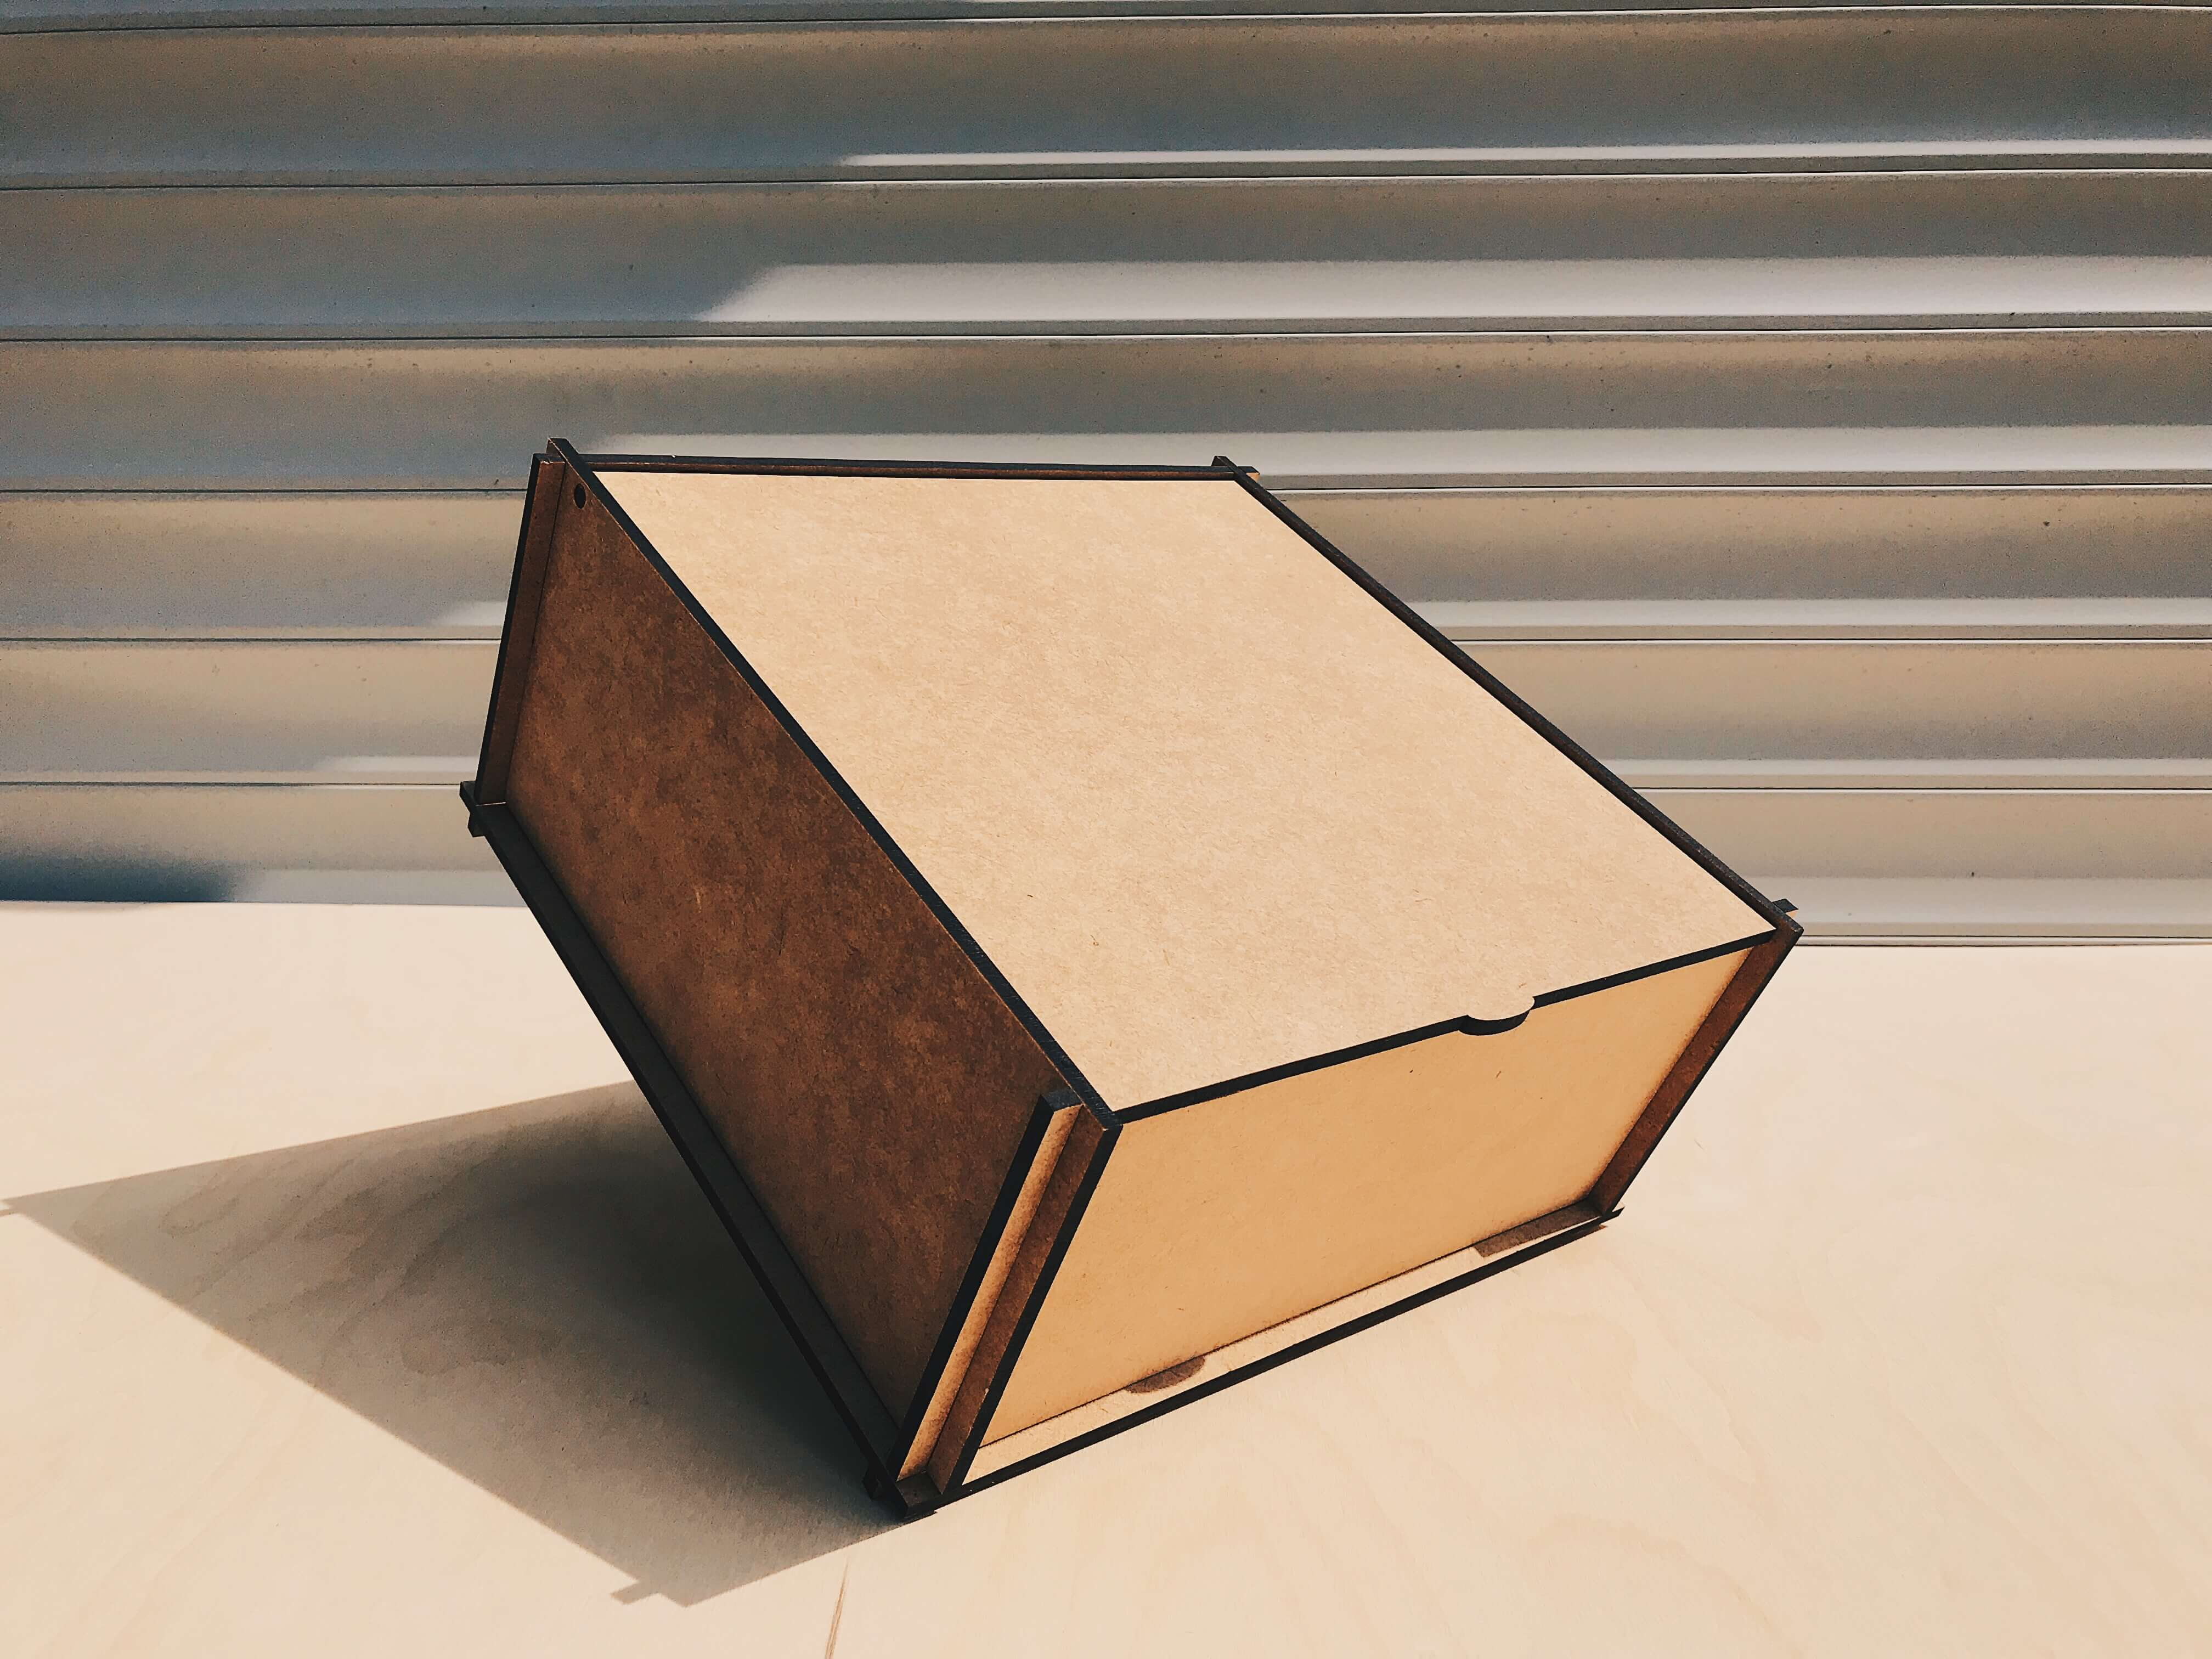 biencraft - лазерная резка и гравировка 4